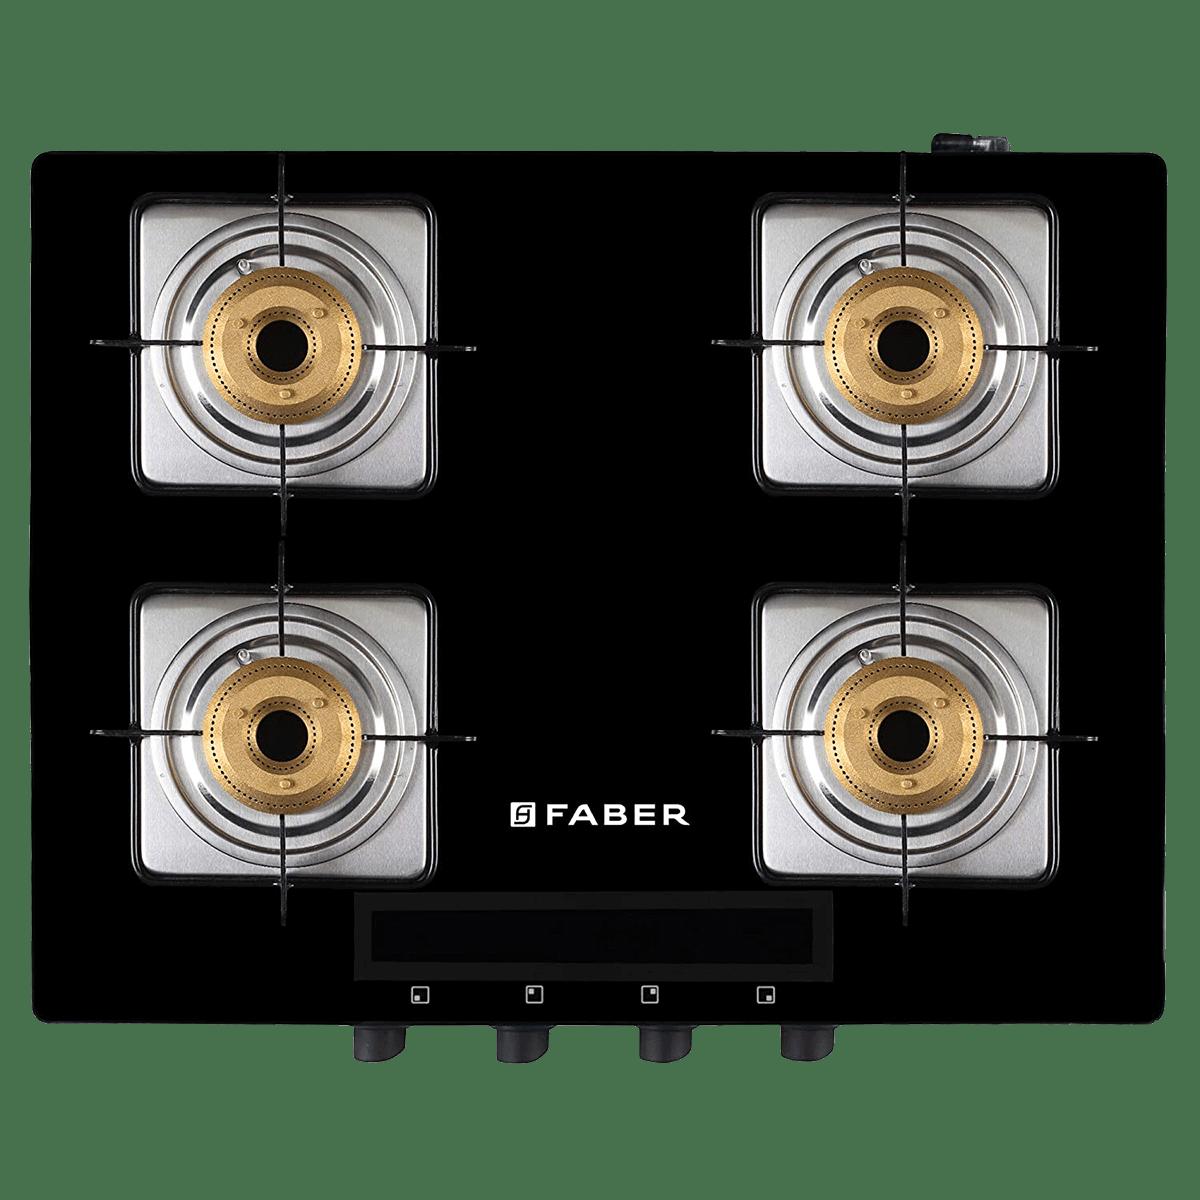 Faber Blaze 4 Burner Tempered Black Glass Gas Stove (HD 4B BK AI, Black)